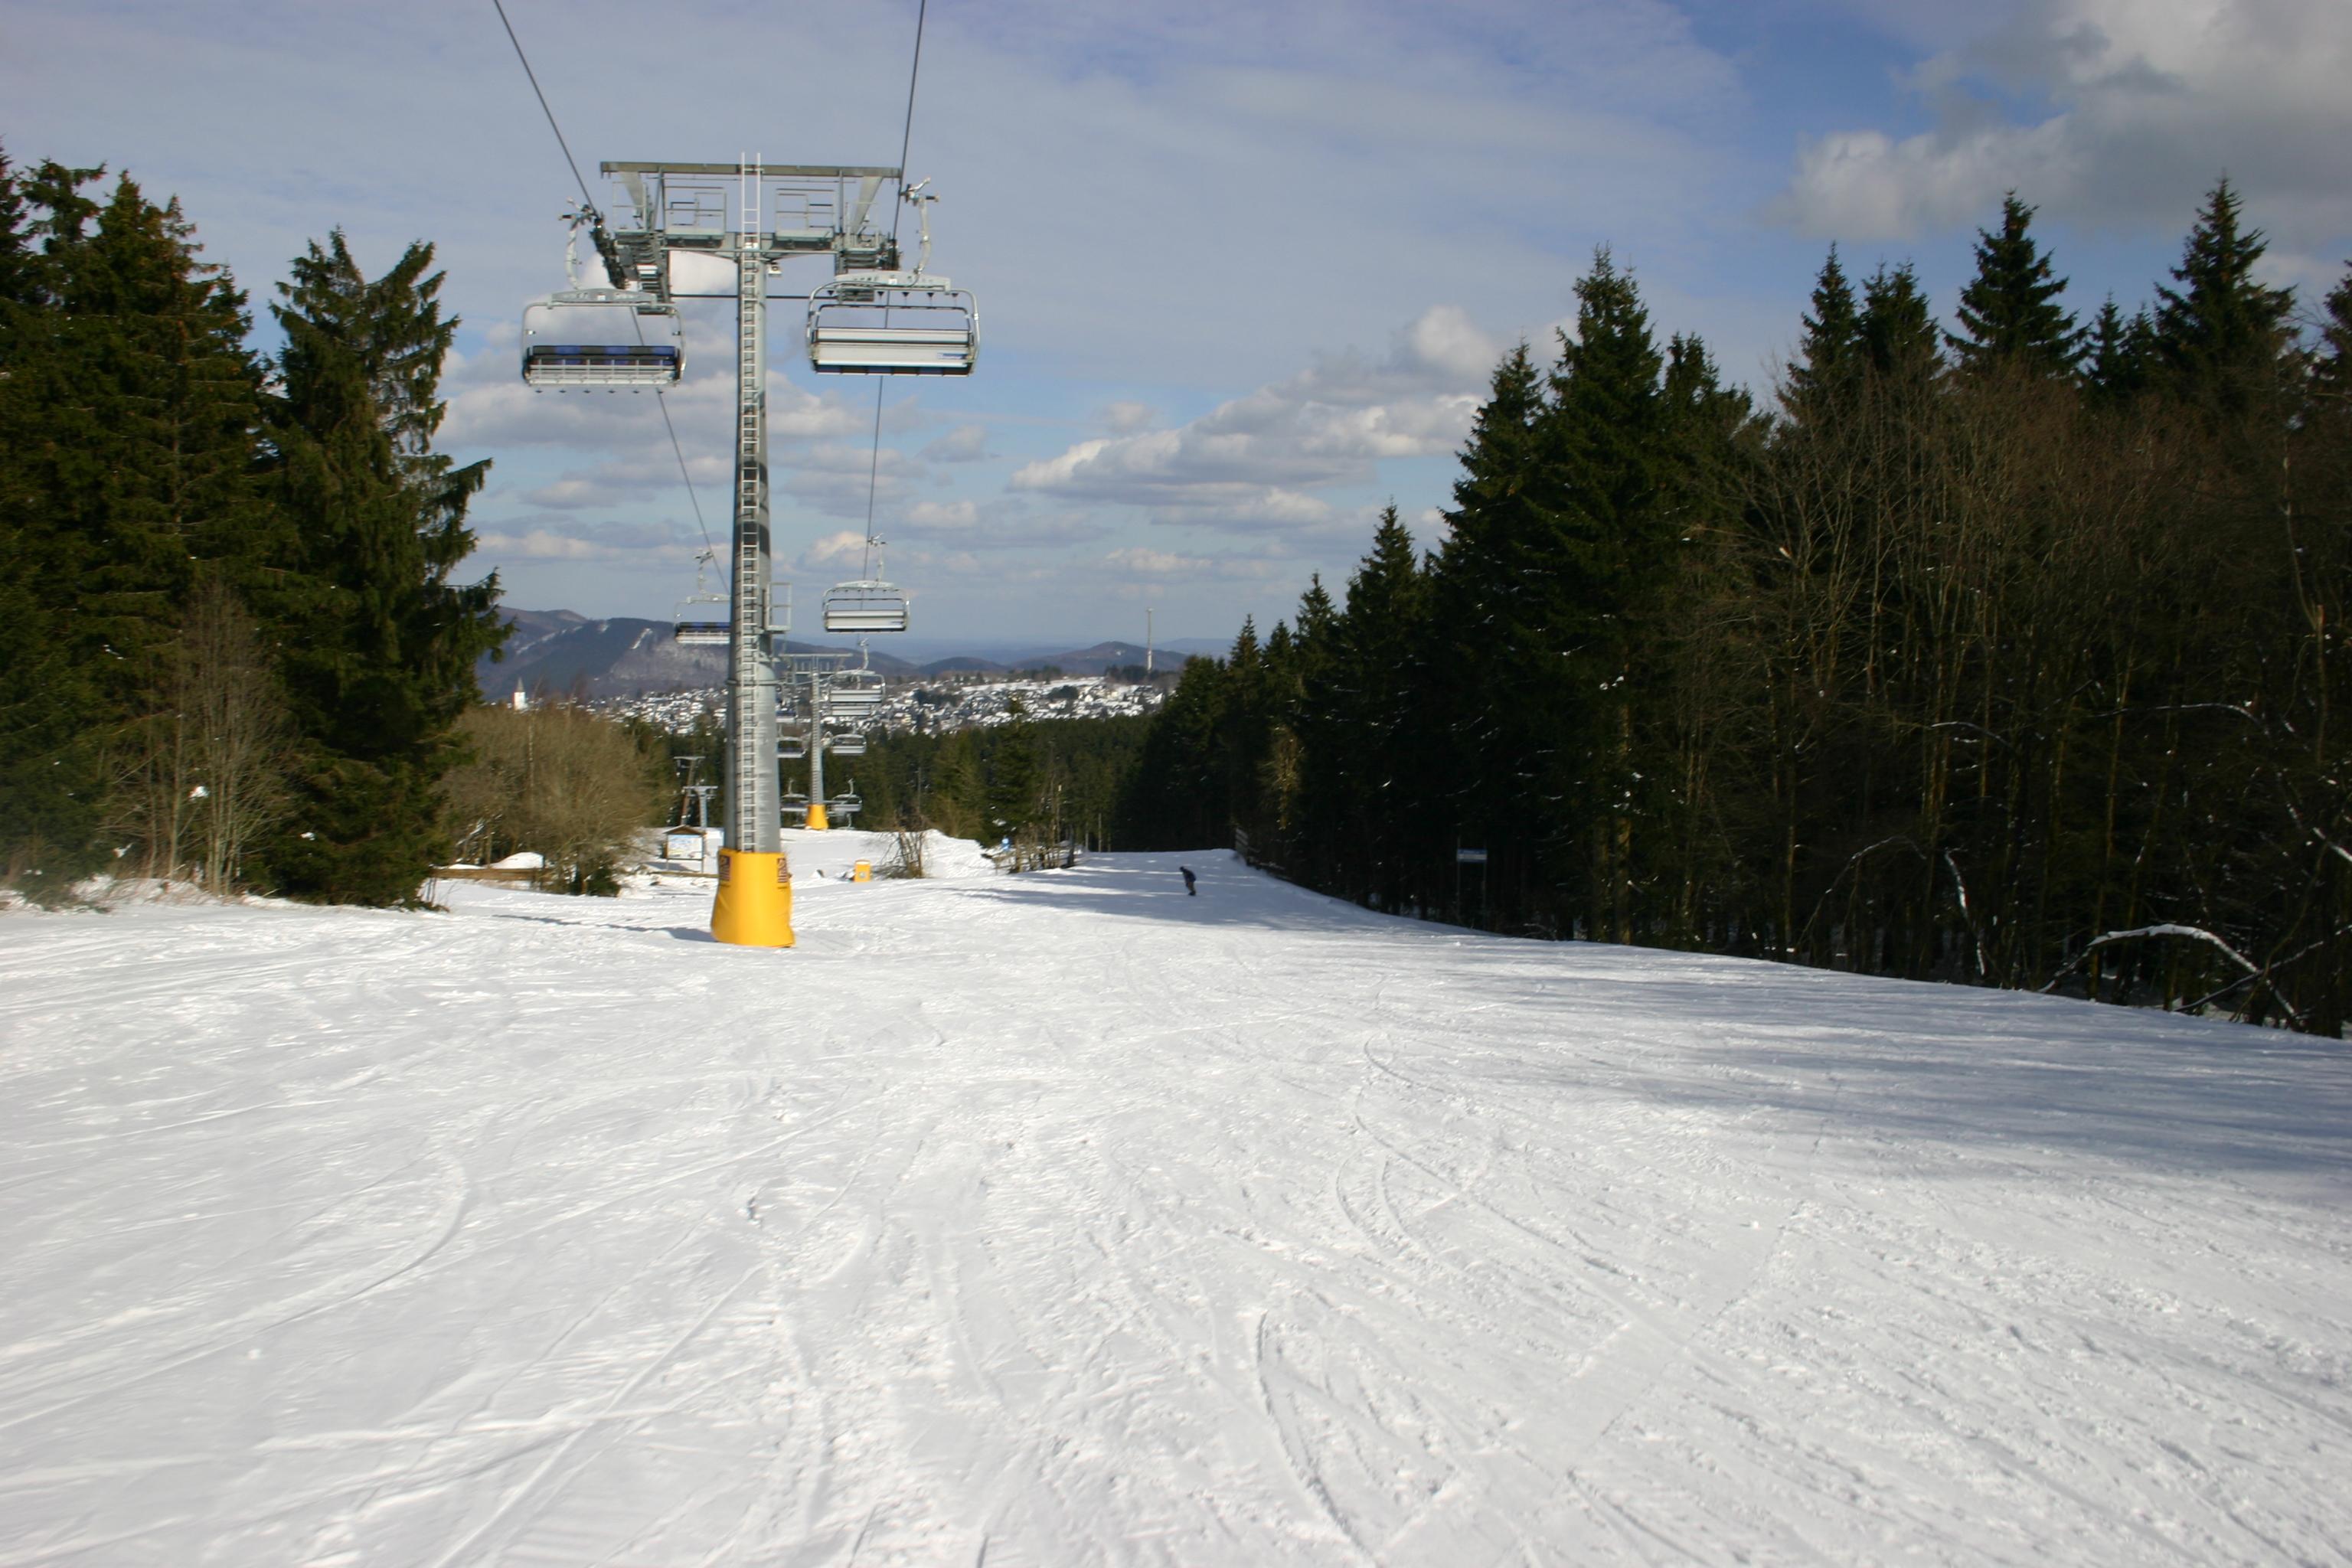 Wintersport Arena Sauerland 269 - Winterberg